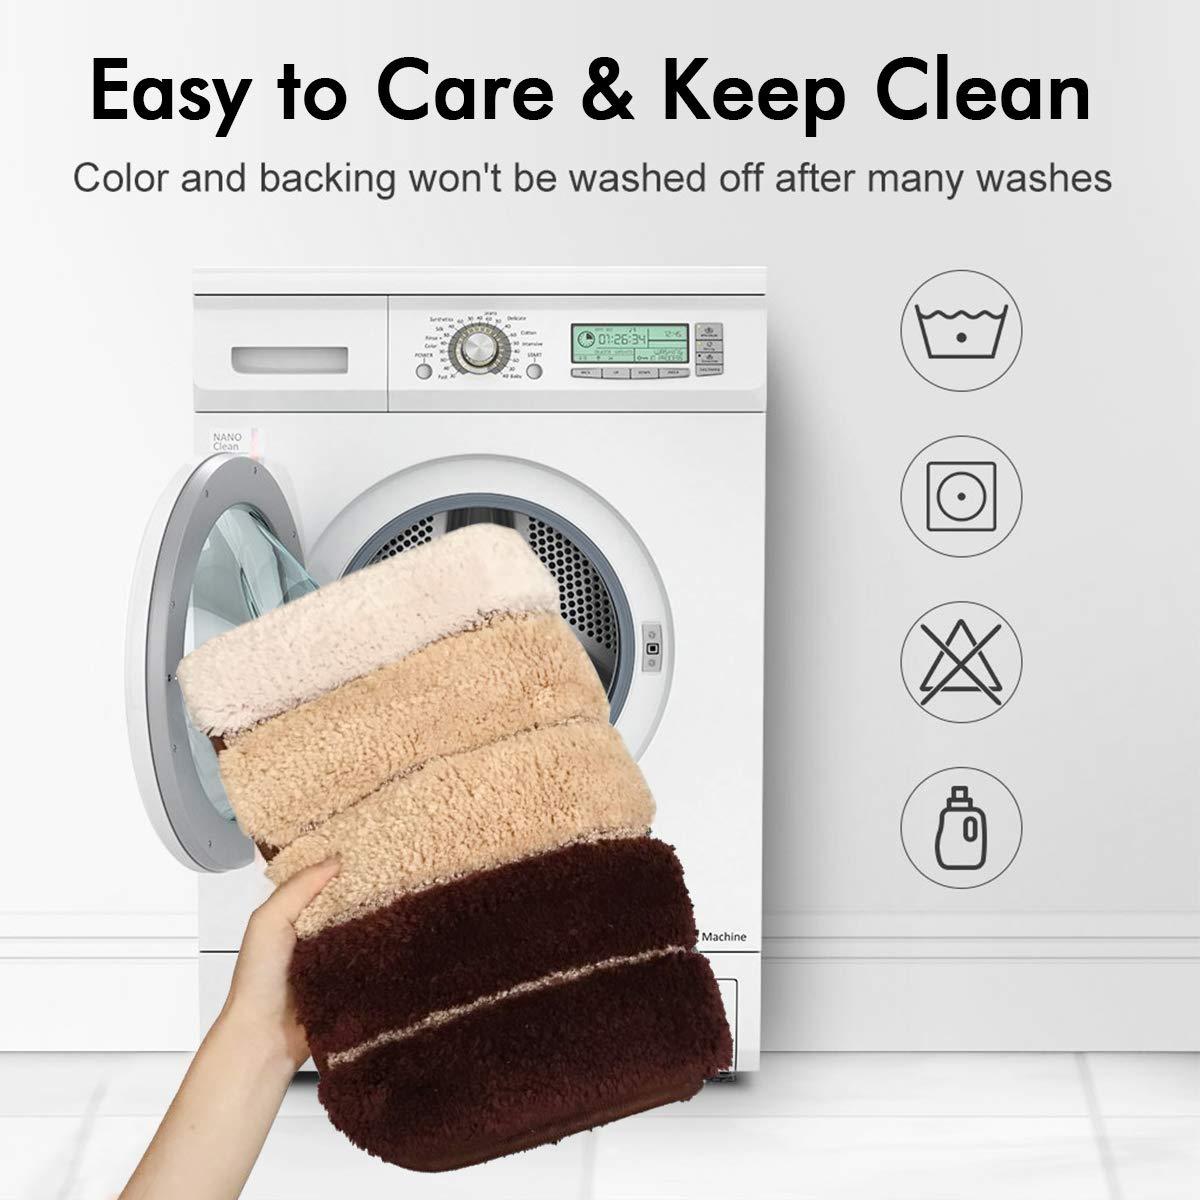 Machine-Washable MAYSHINE Bath mats Bathroom Rugs 20-Inch-by-31-Inch Bath Mat Rug Perfect Doormats Tub Shower Non-Slip Soft Fluffy Water Absorbent Shaggy D8 Microfiber Brown